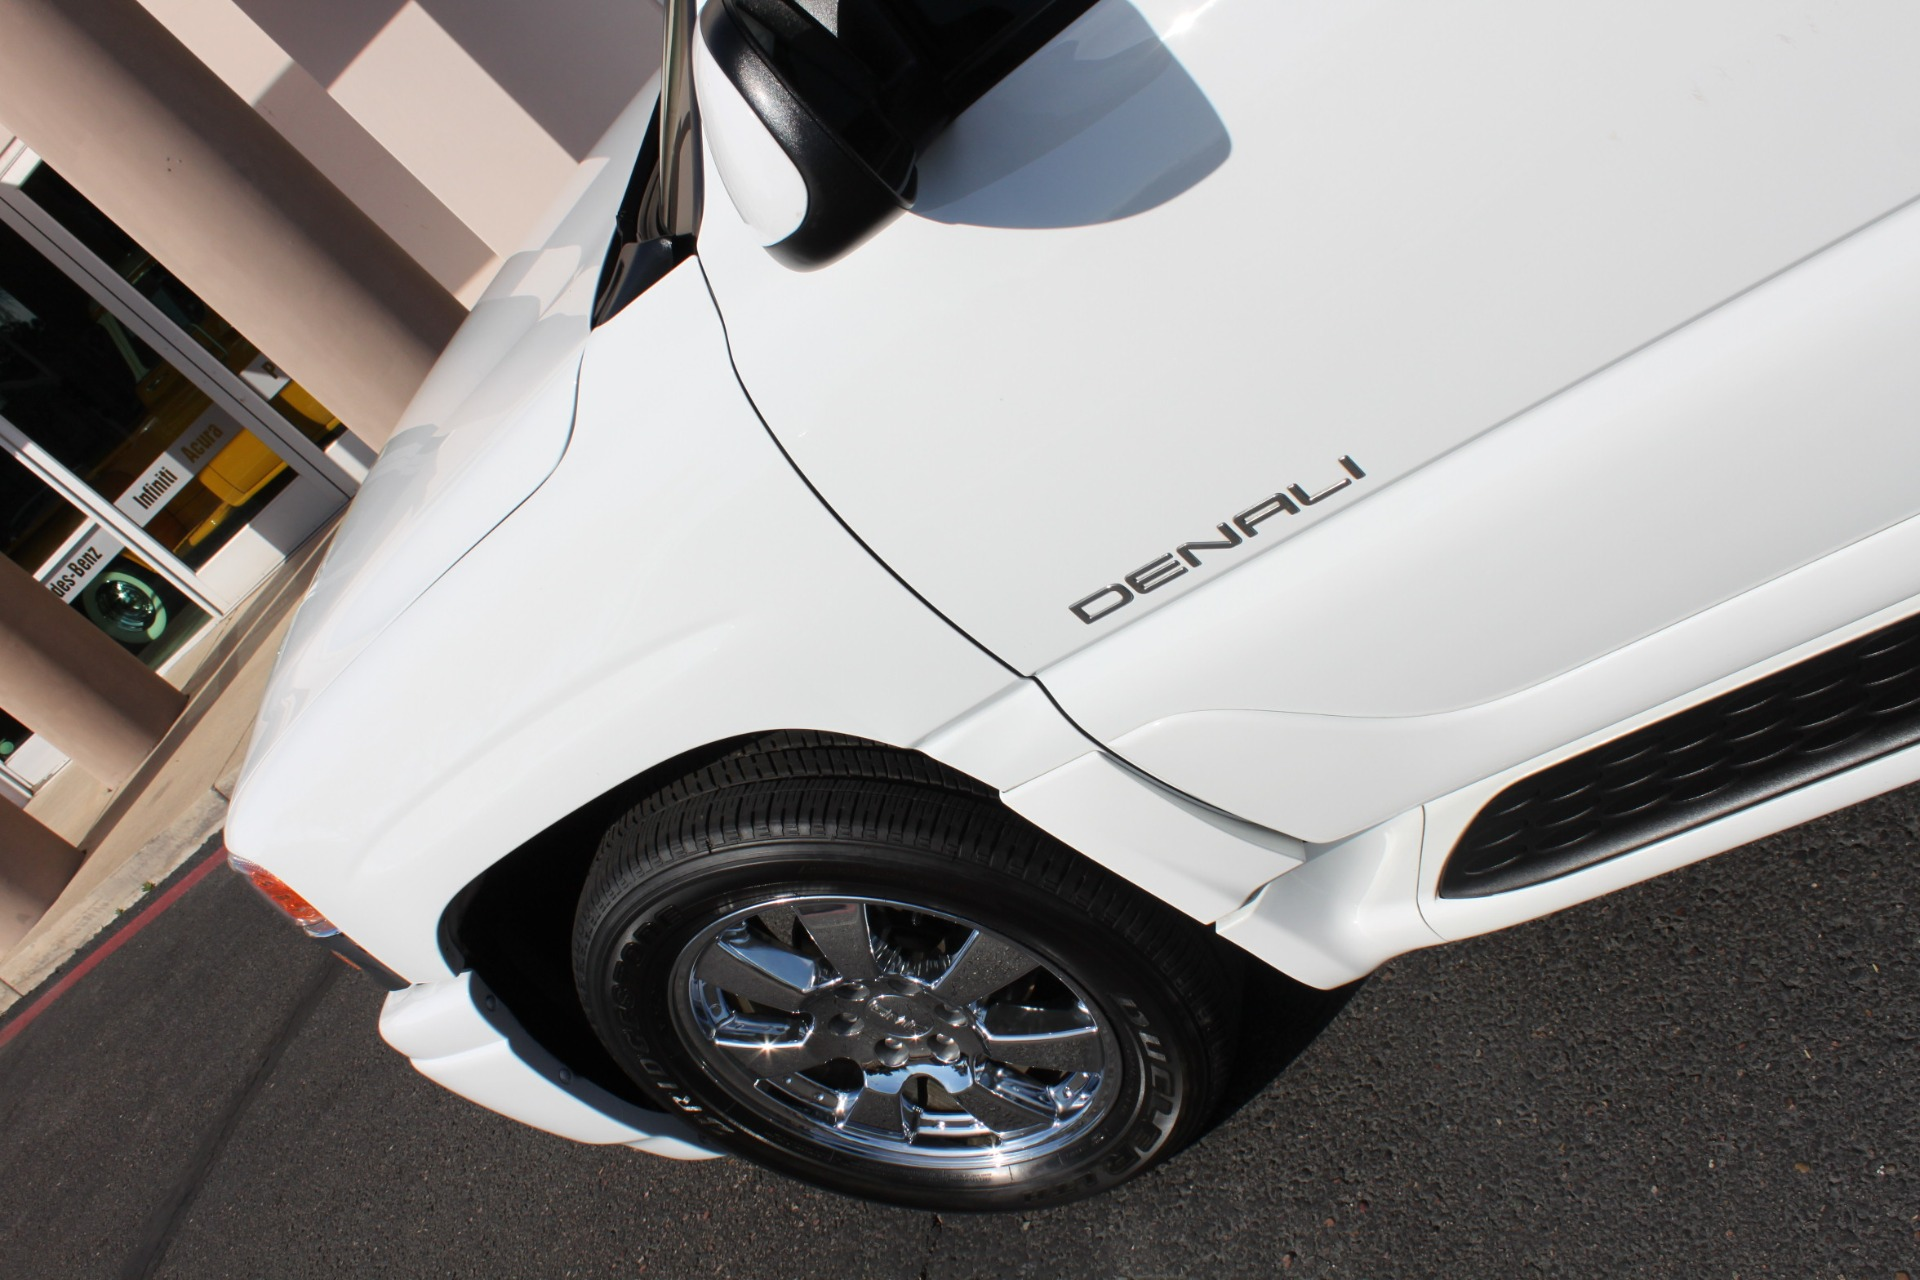 Used-2006-GMC-Yukon-Denali-AWD-Acura